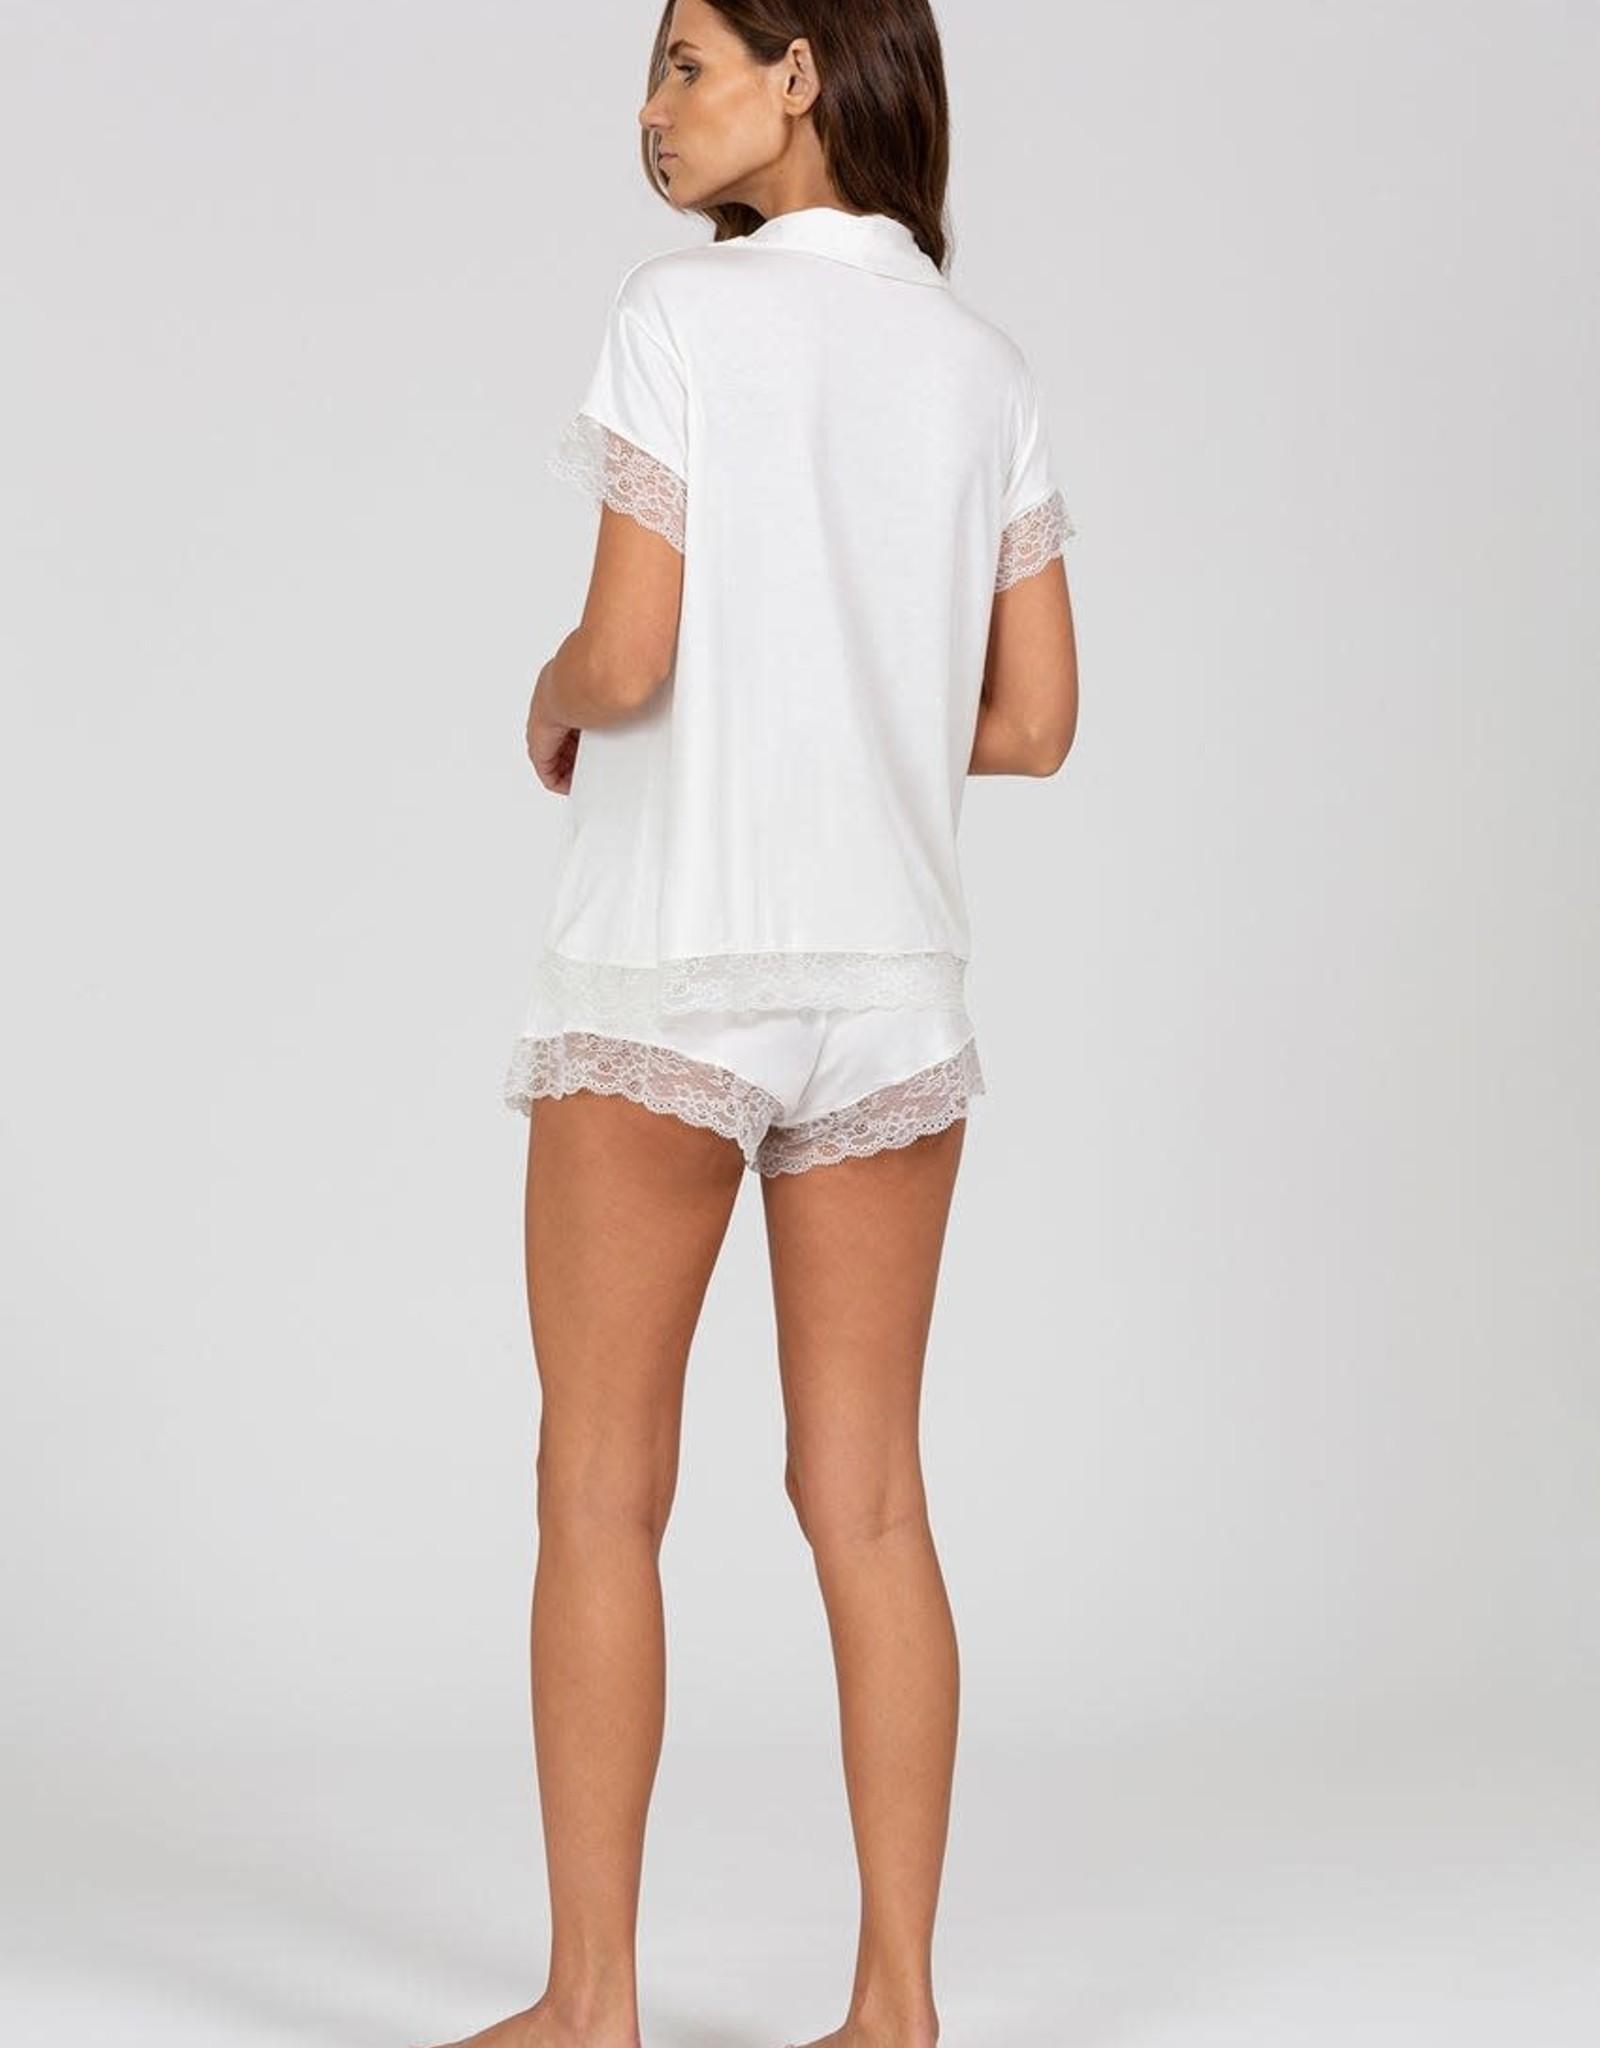 Eberjey Malou Lace Short Set Ivory